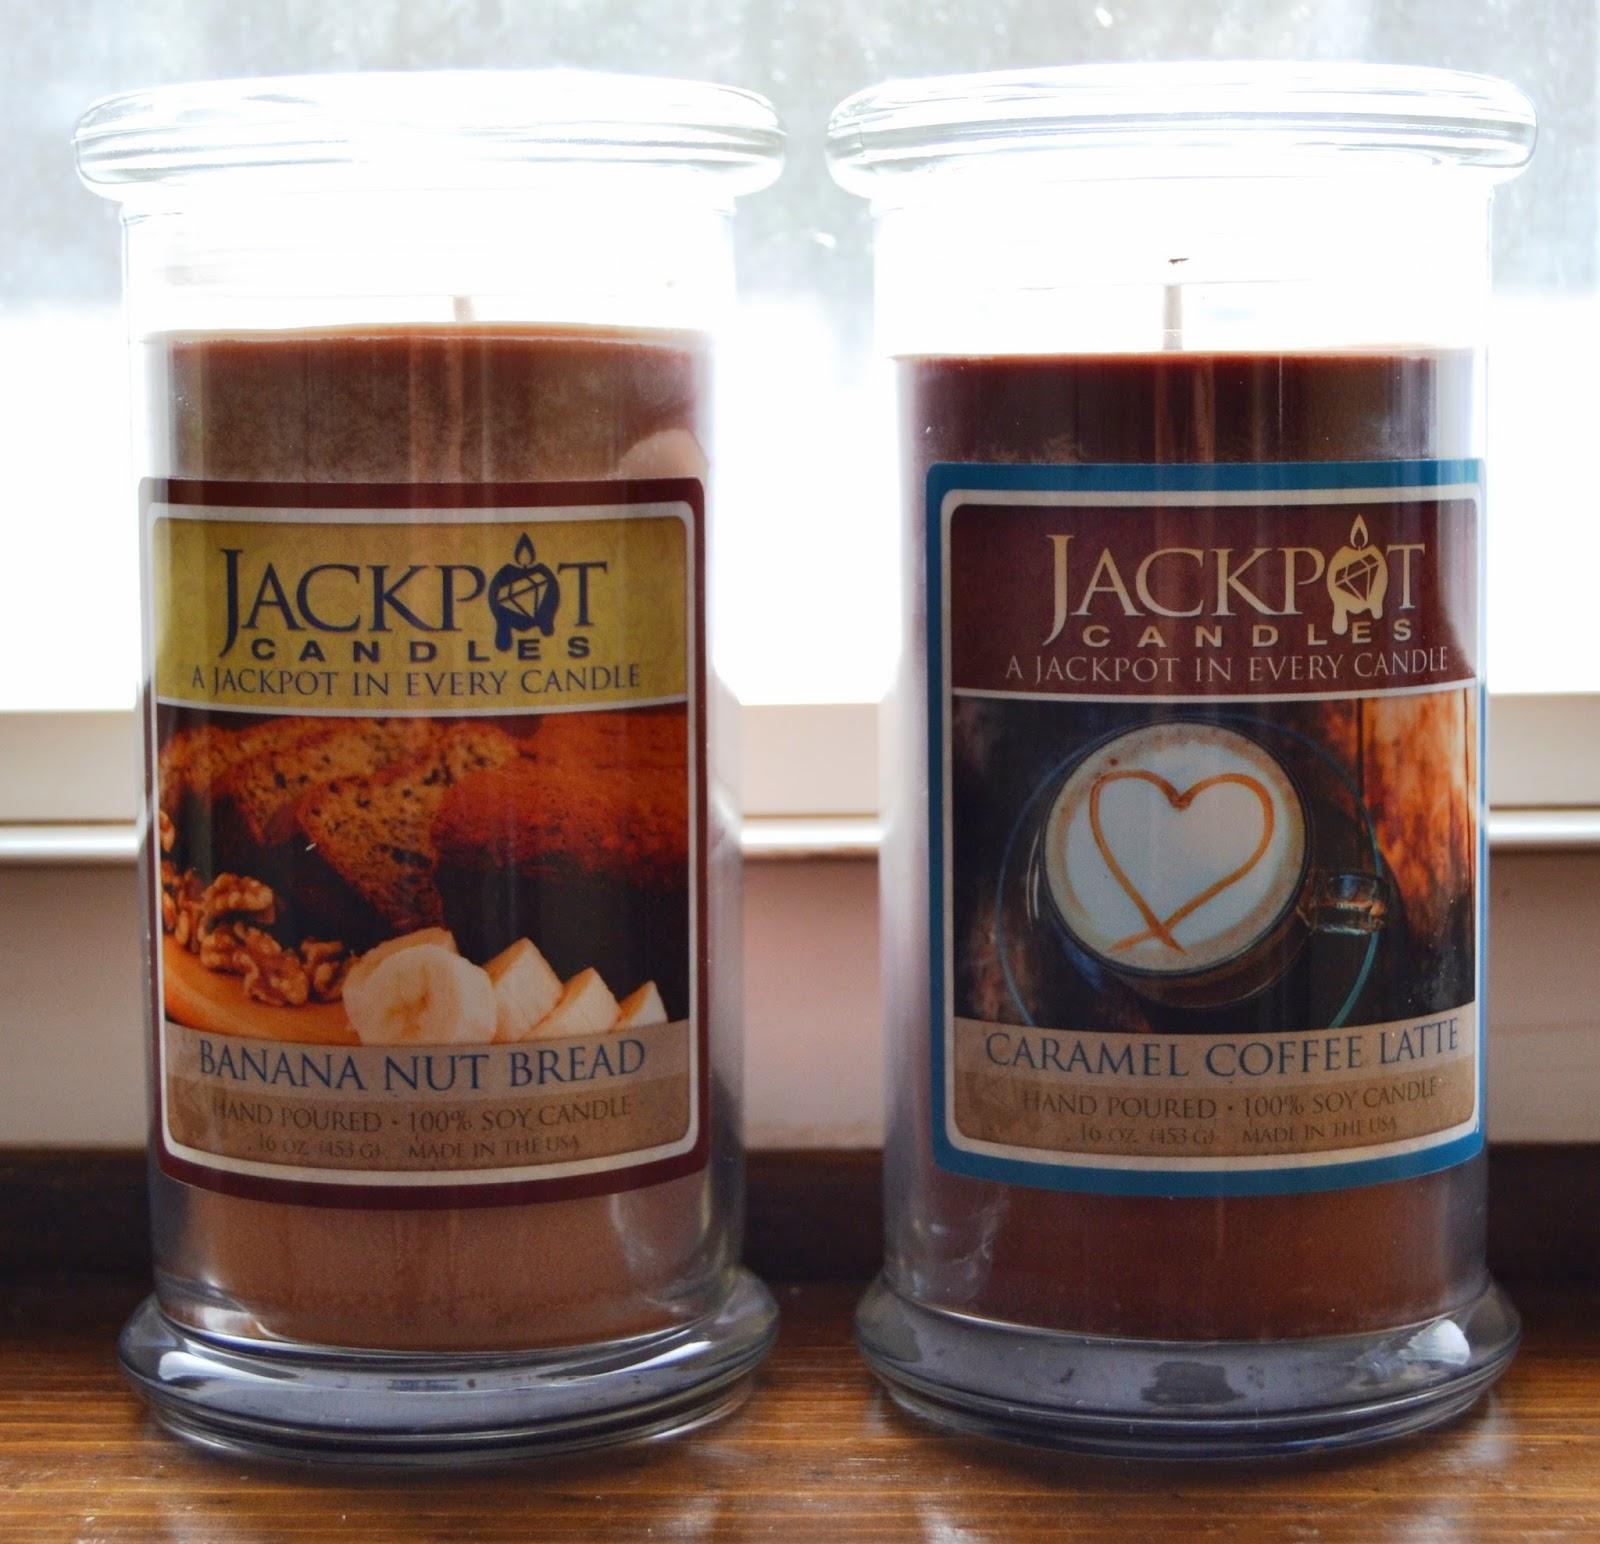 Jackpot Candles